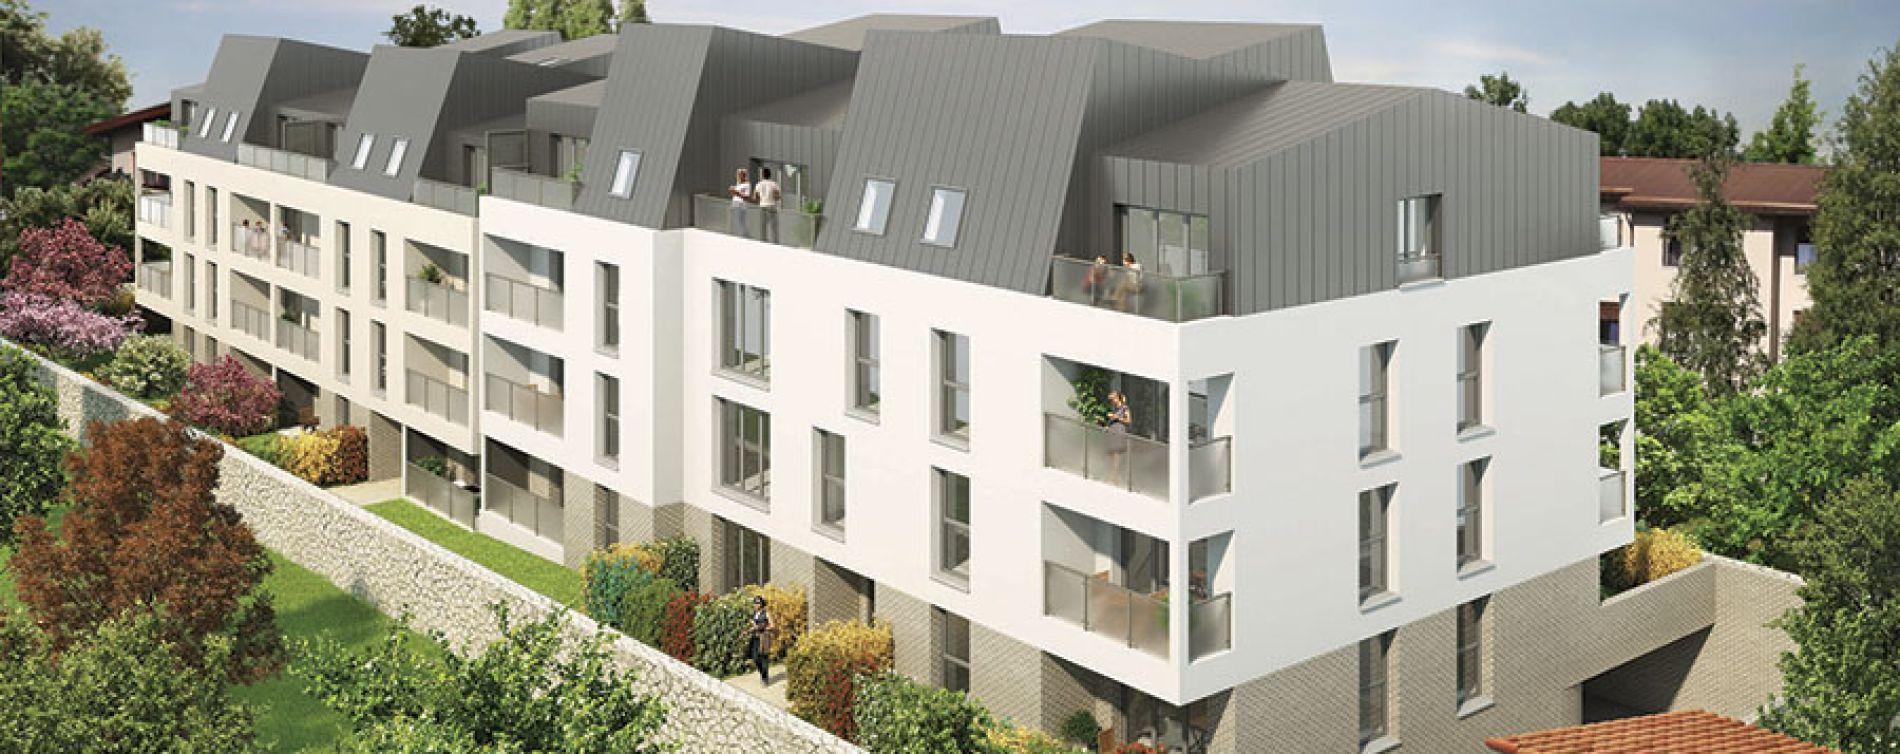 Melun : programme immobilier neuve « Pallas Résidence » (2)